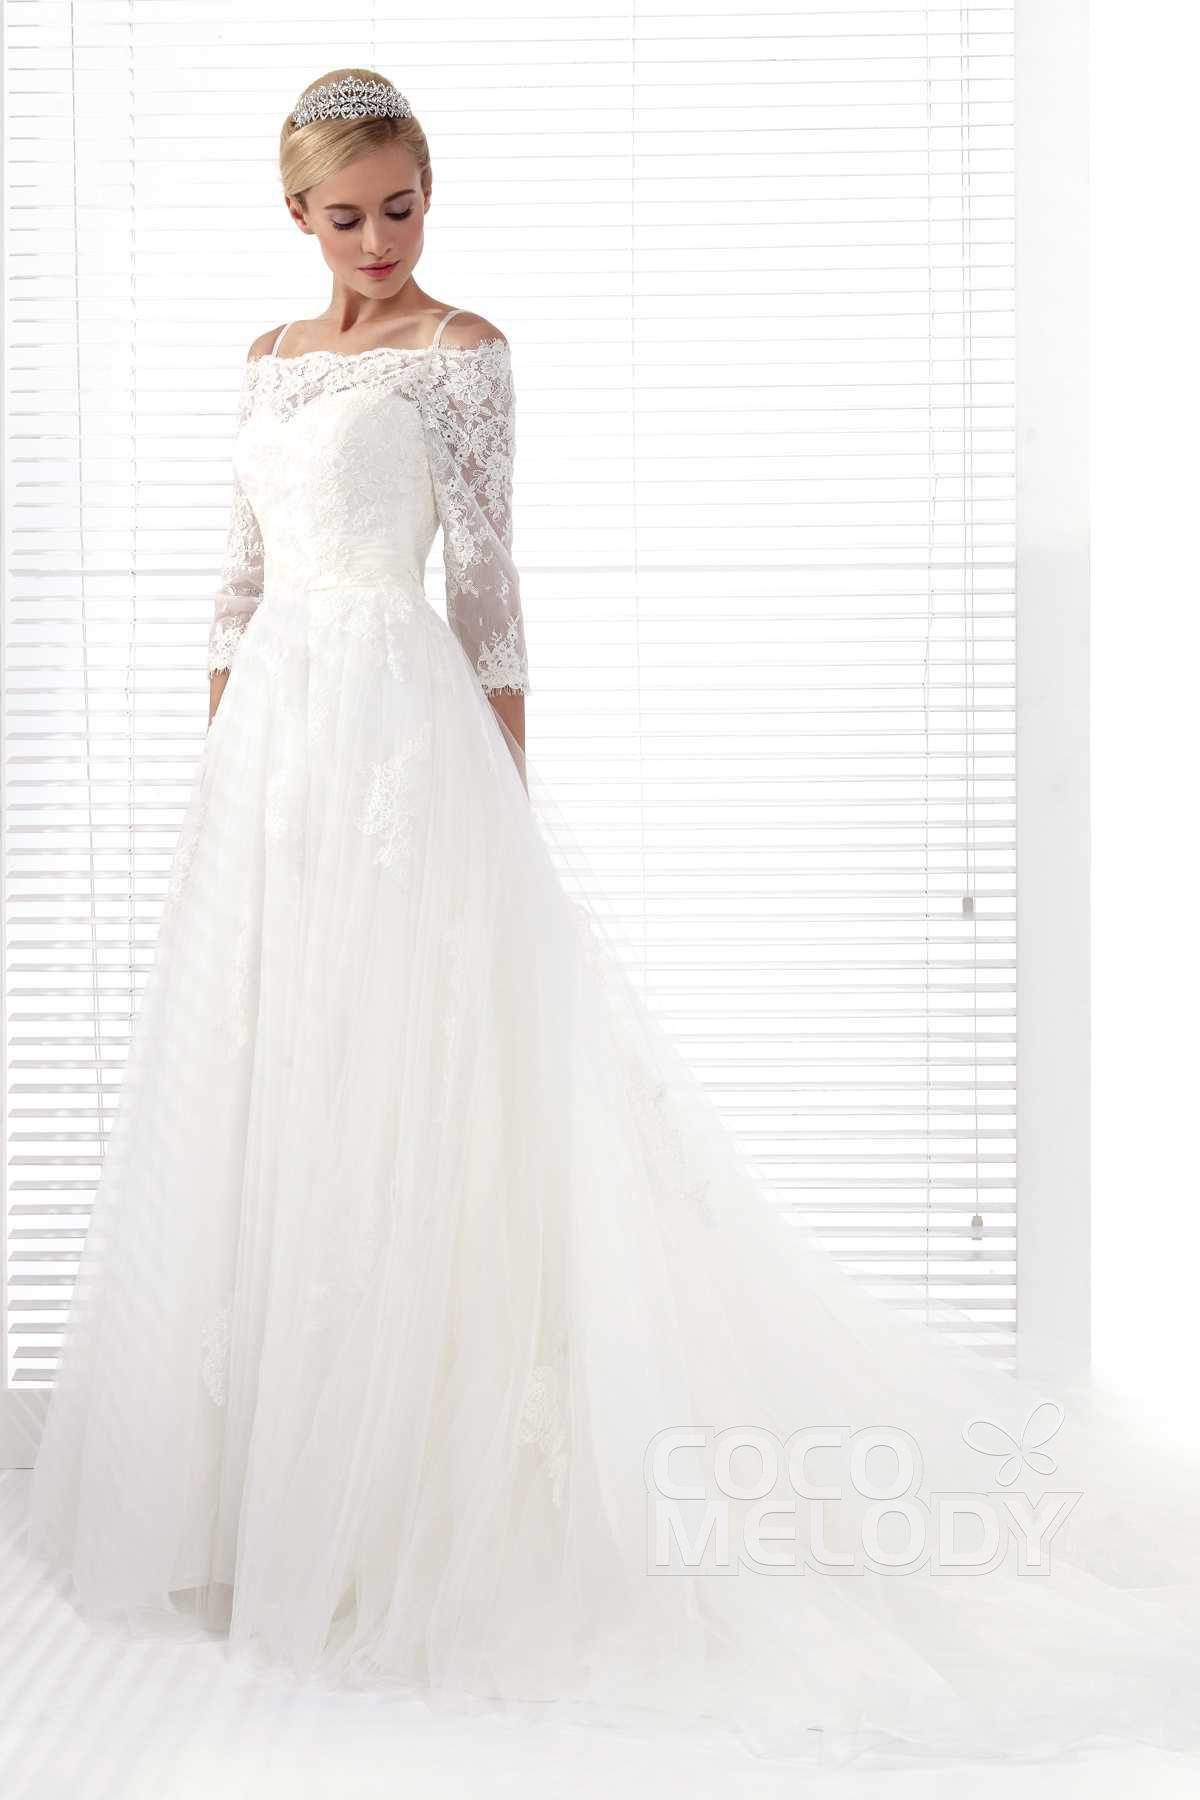 Lace strap wedding dress  Glamorous ALine Spaghetti Strap Chapel Train Tulle Wedding Dress